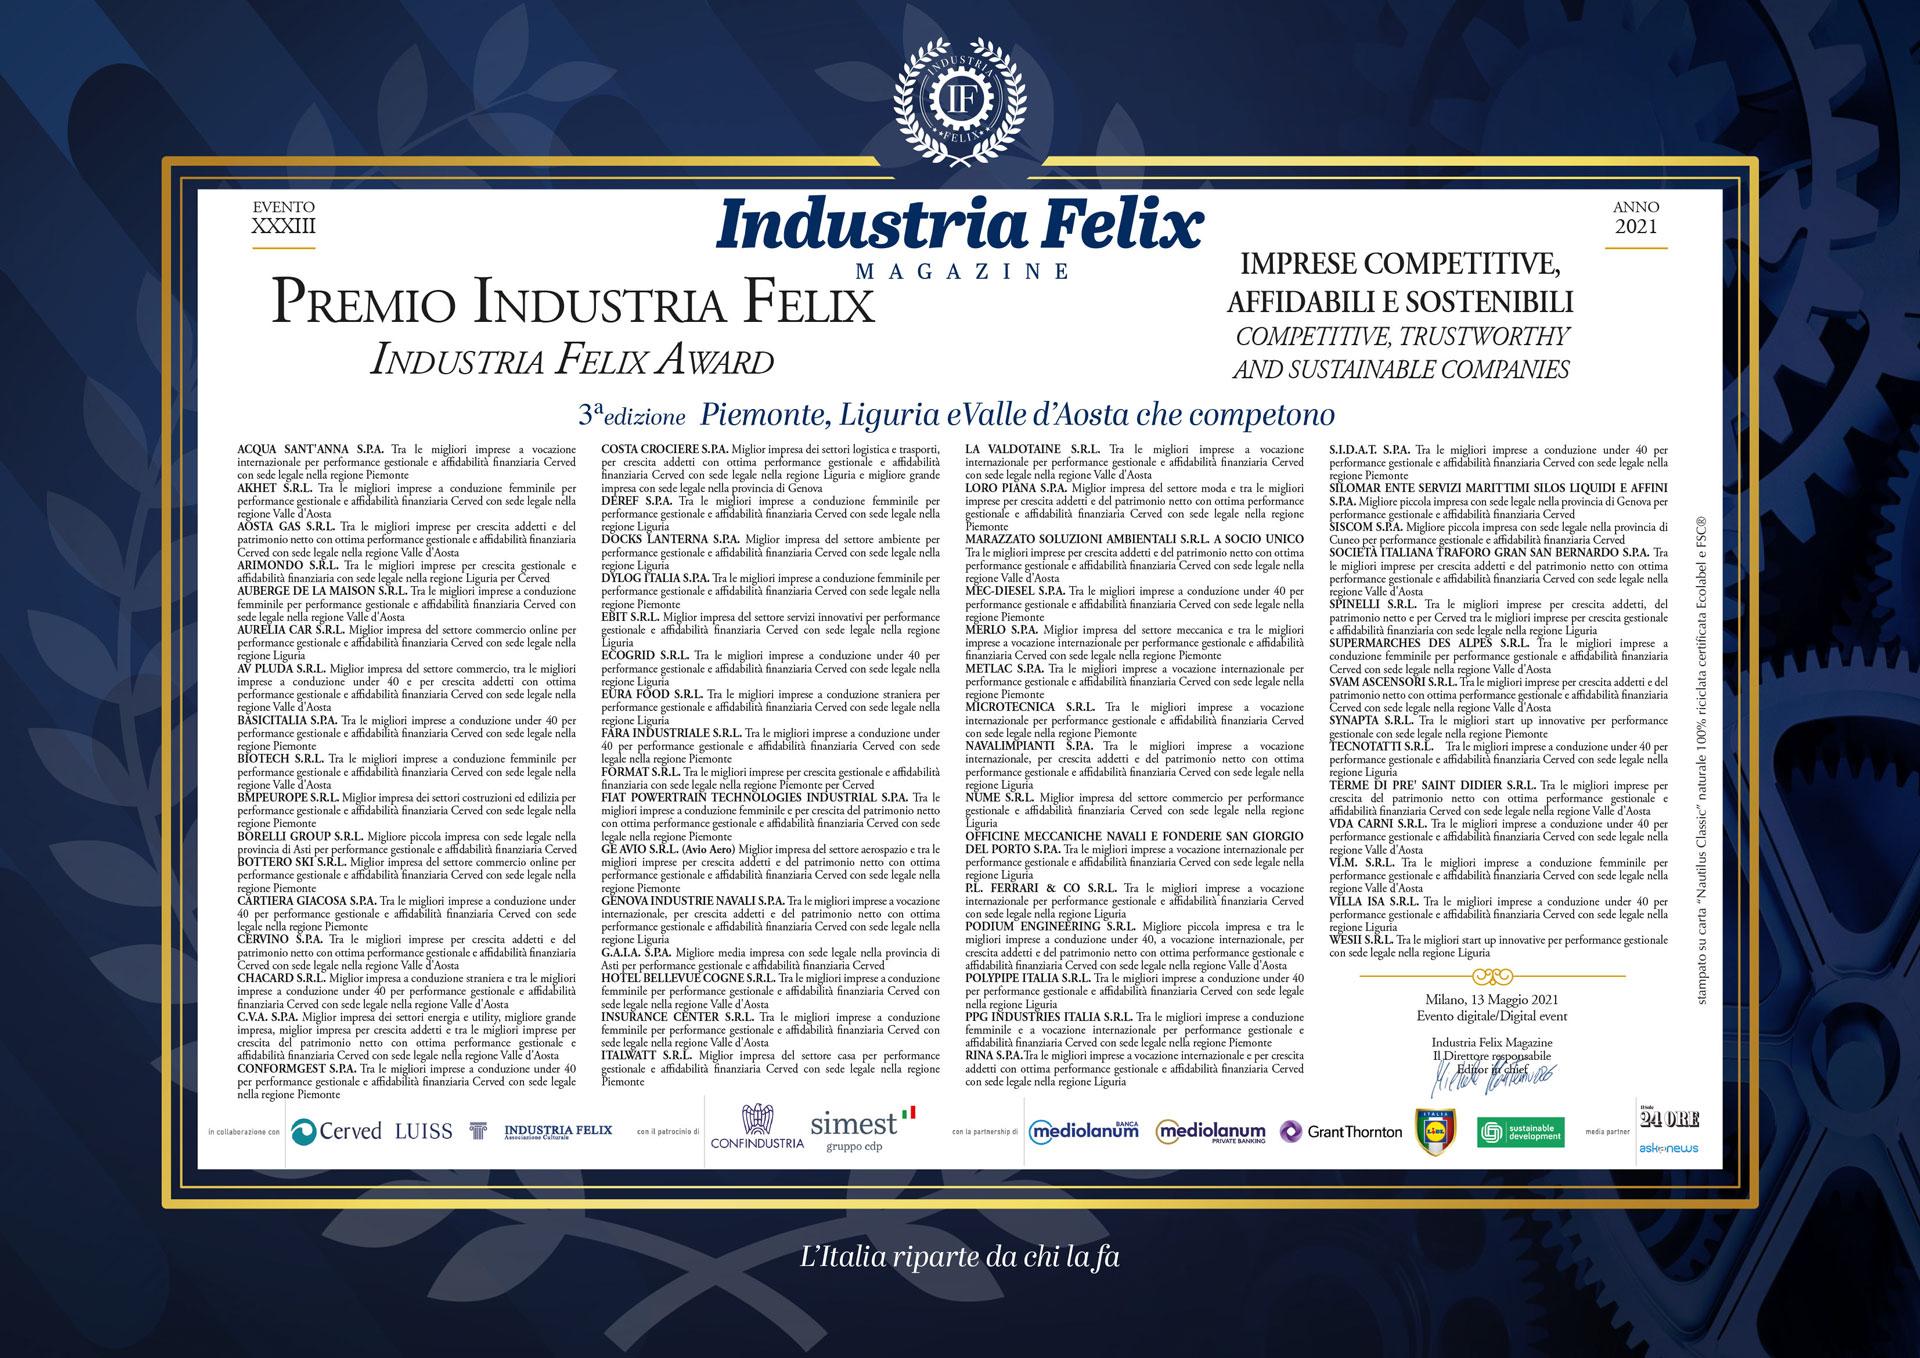 Albo d'Oro 2021: Piemonte, Liguria, Valle d'Aosta (13/05/2021)